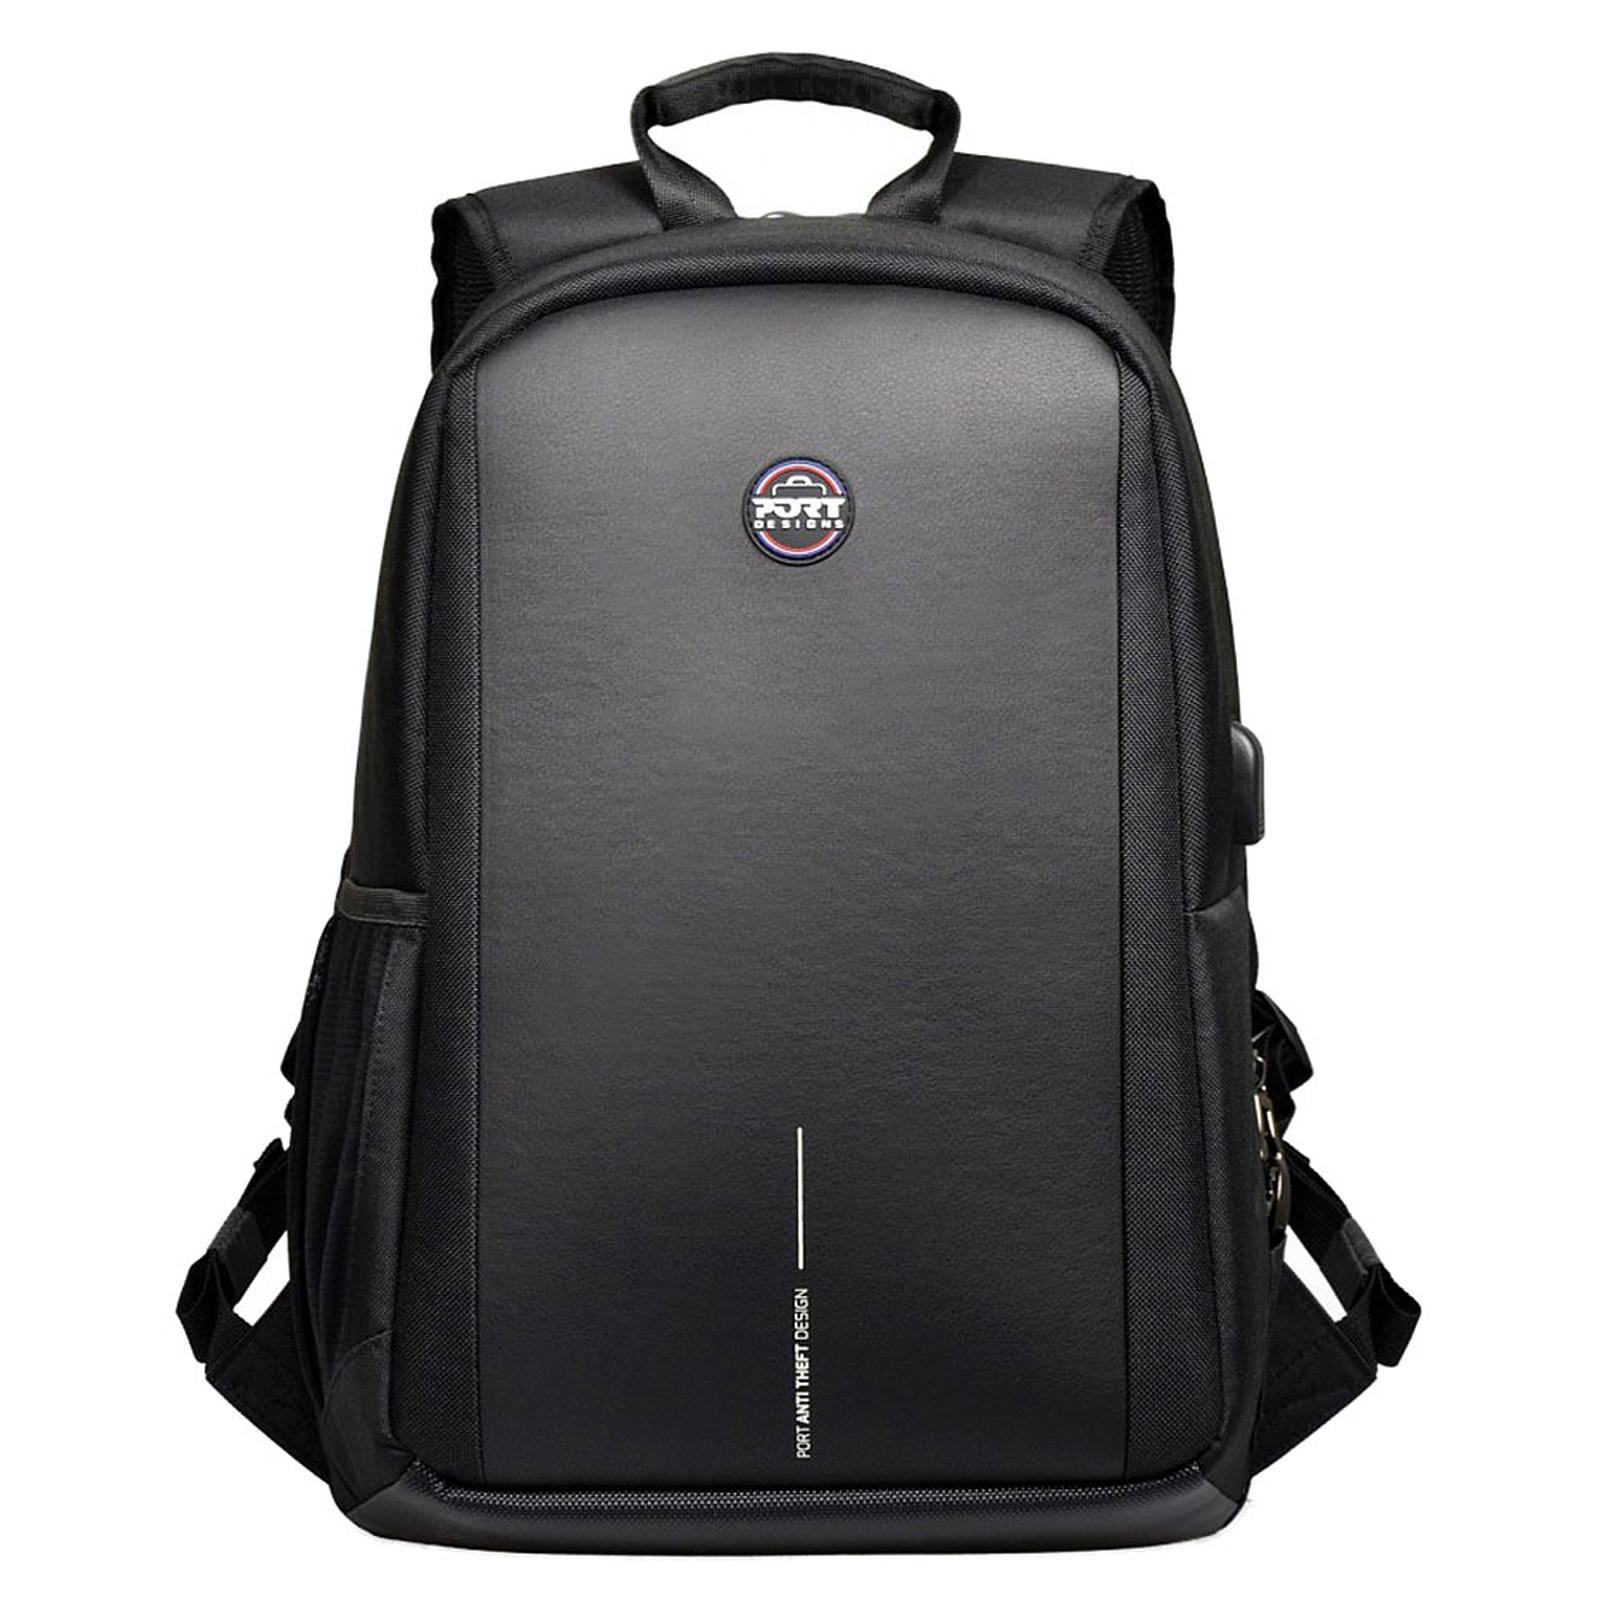 "PORT Designs Chicago Evo Backpack 13/15.6""."